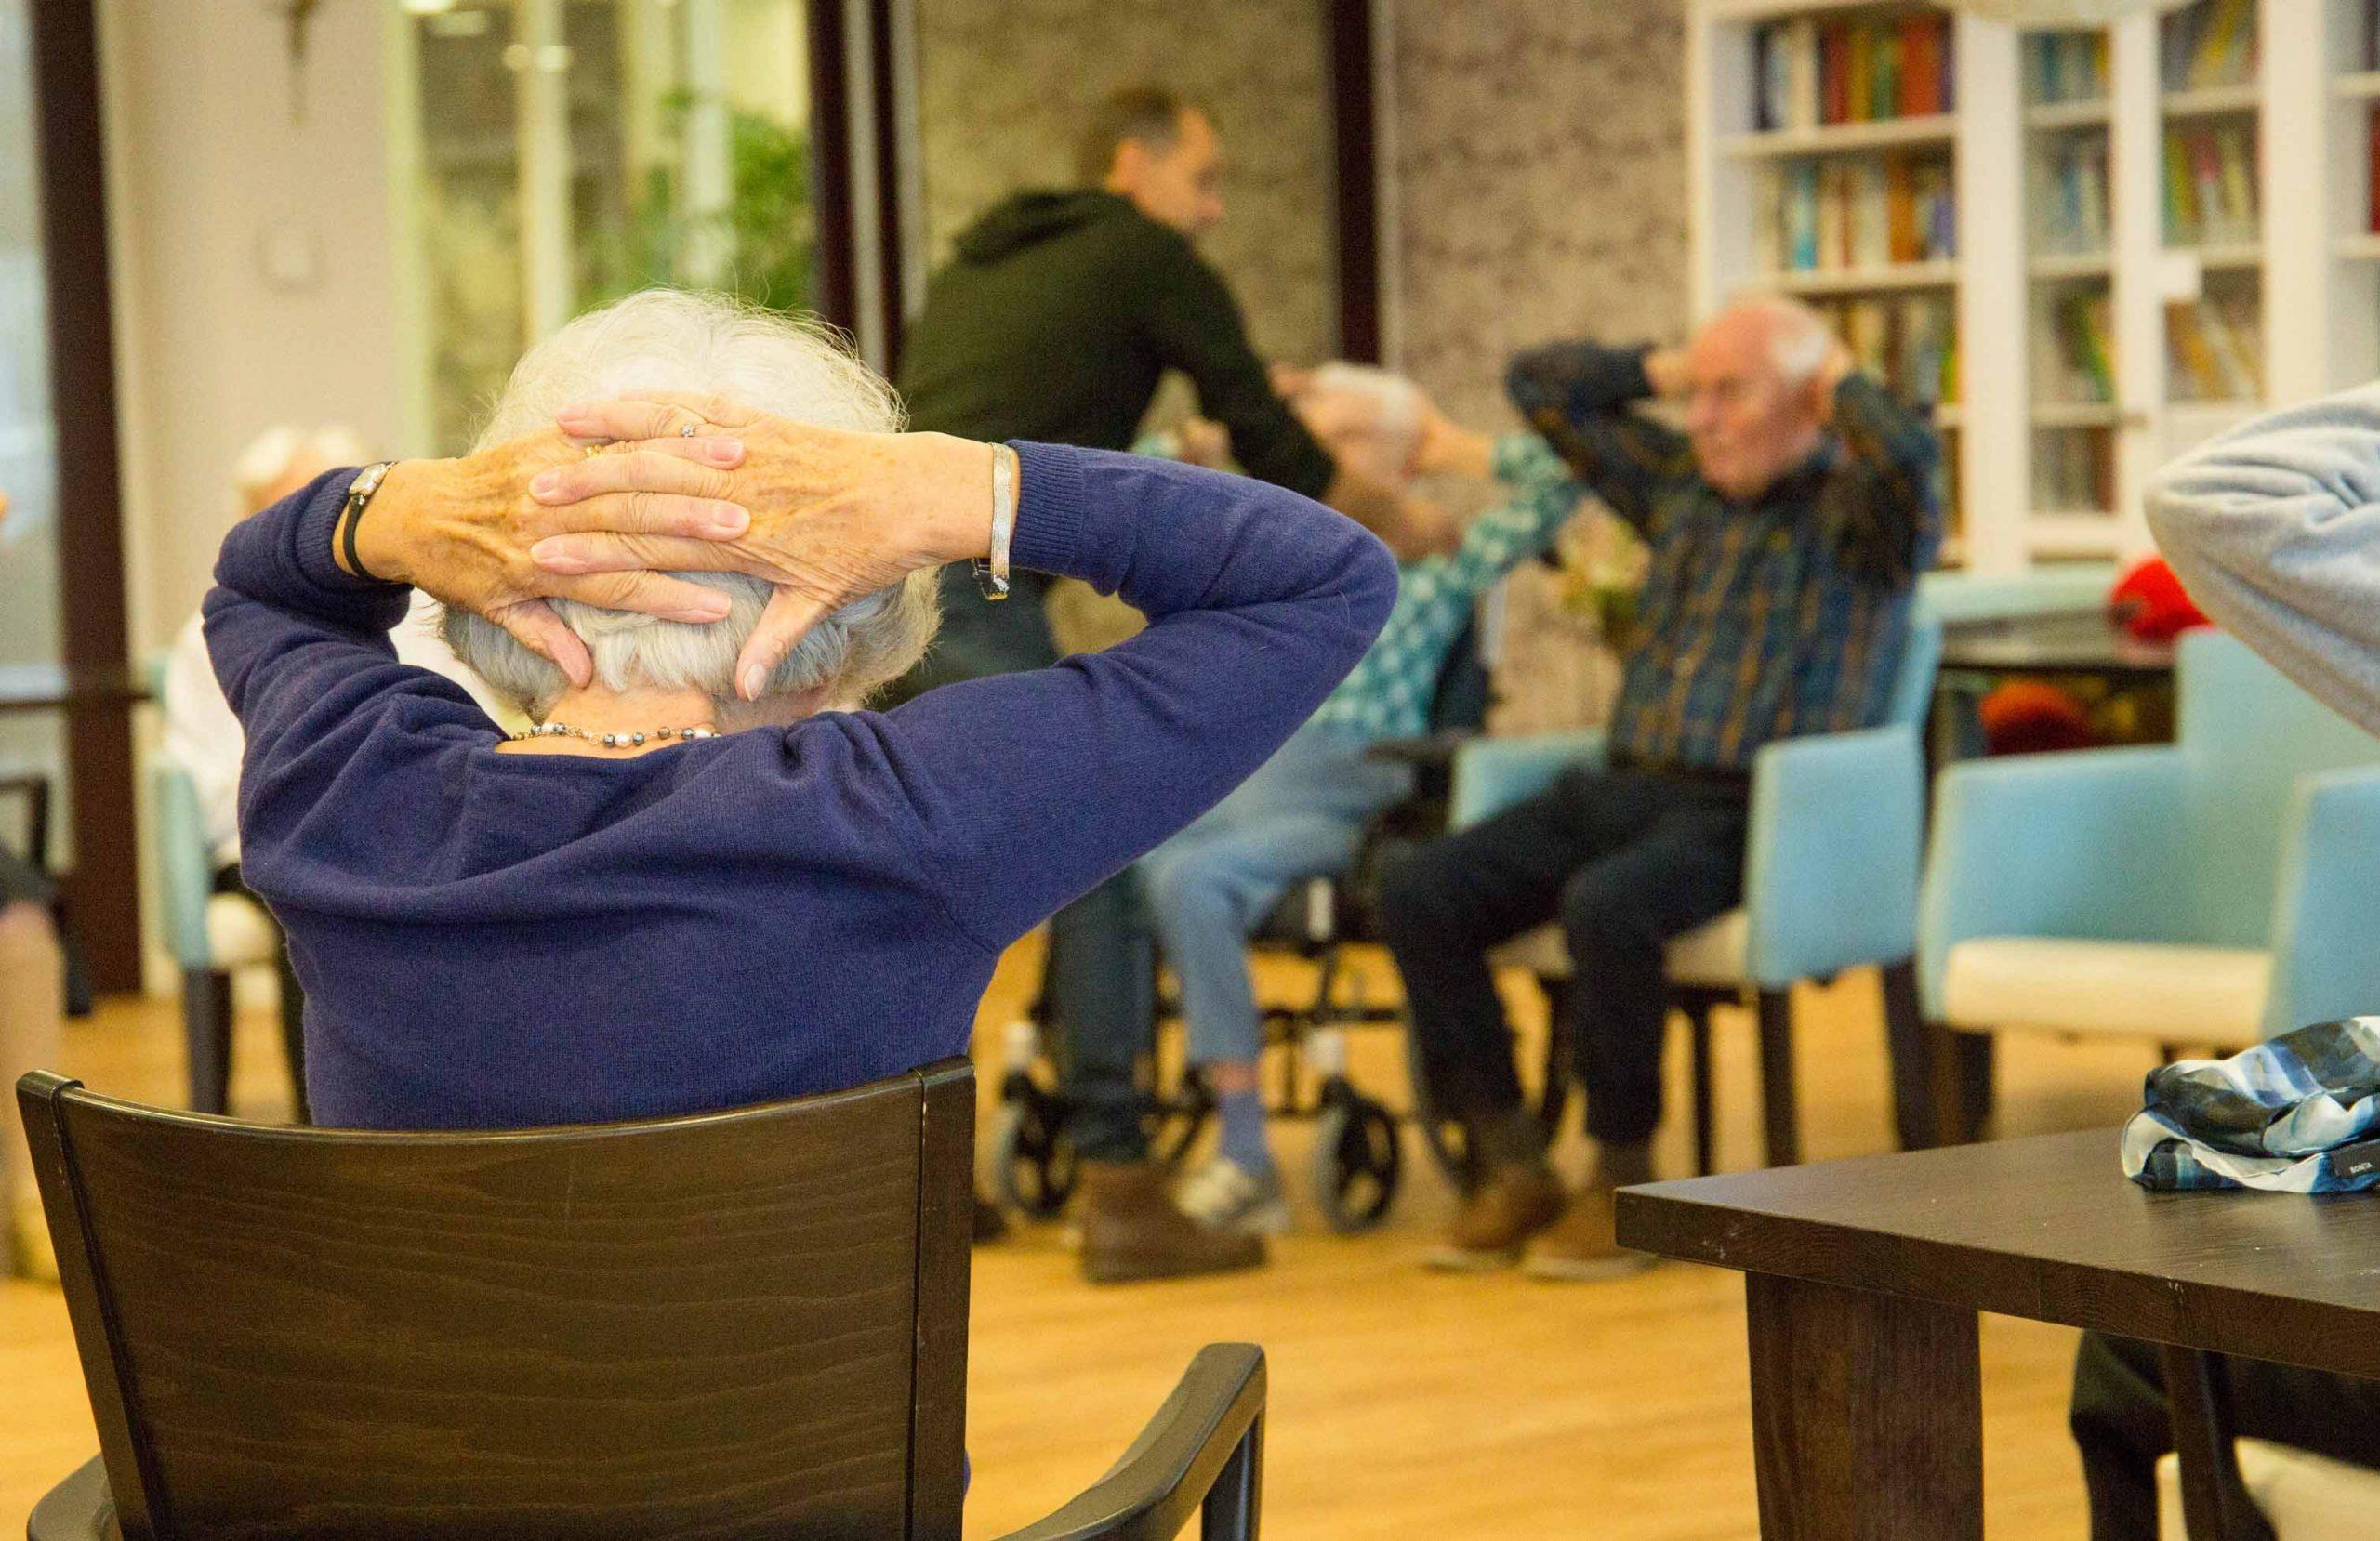 Ouderengymnastiek Leiden Roomburgh